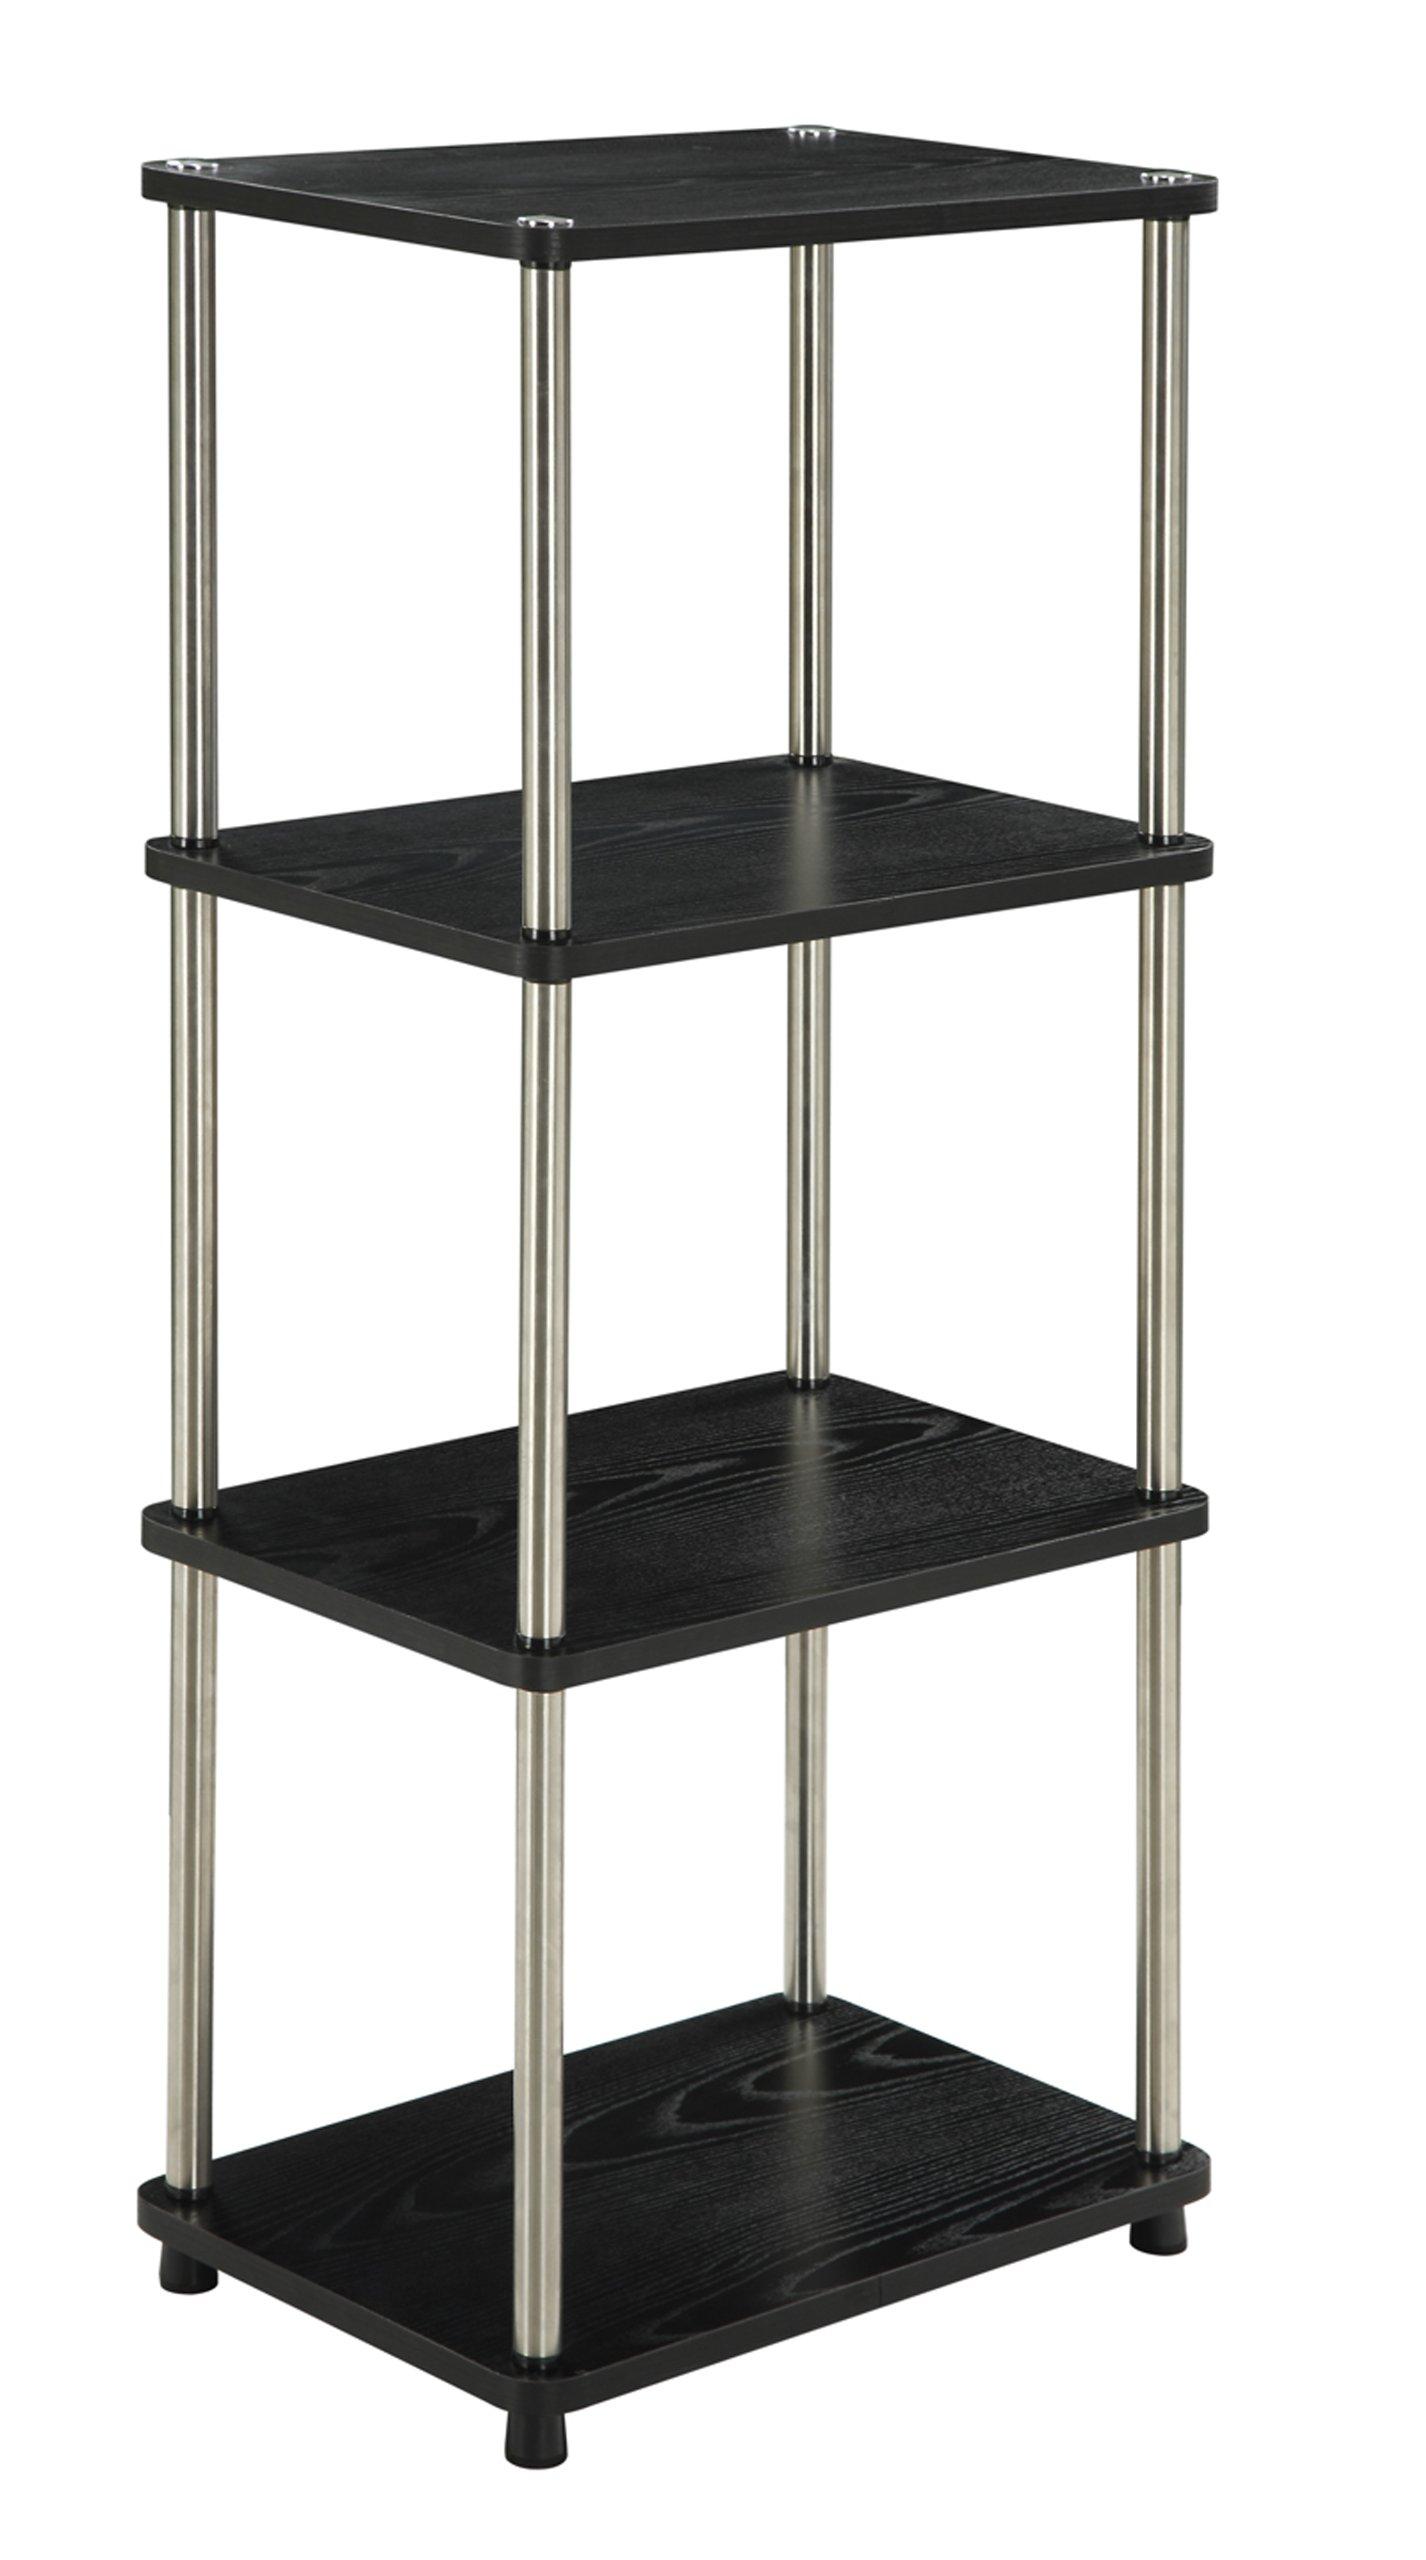 Convenience Concepts Designs2Go 4-Tier Bookshelf/Media Tower, Black